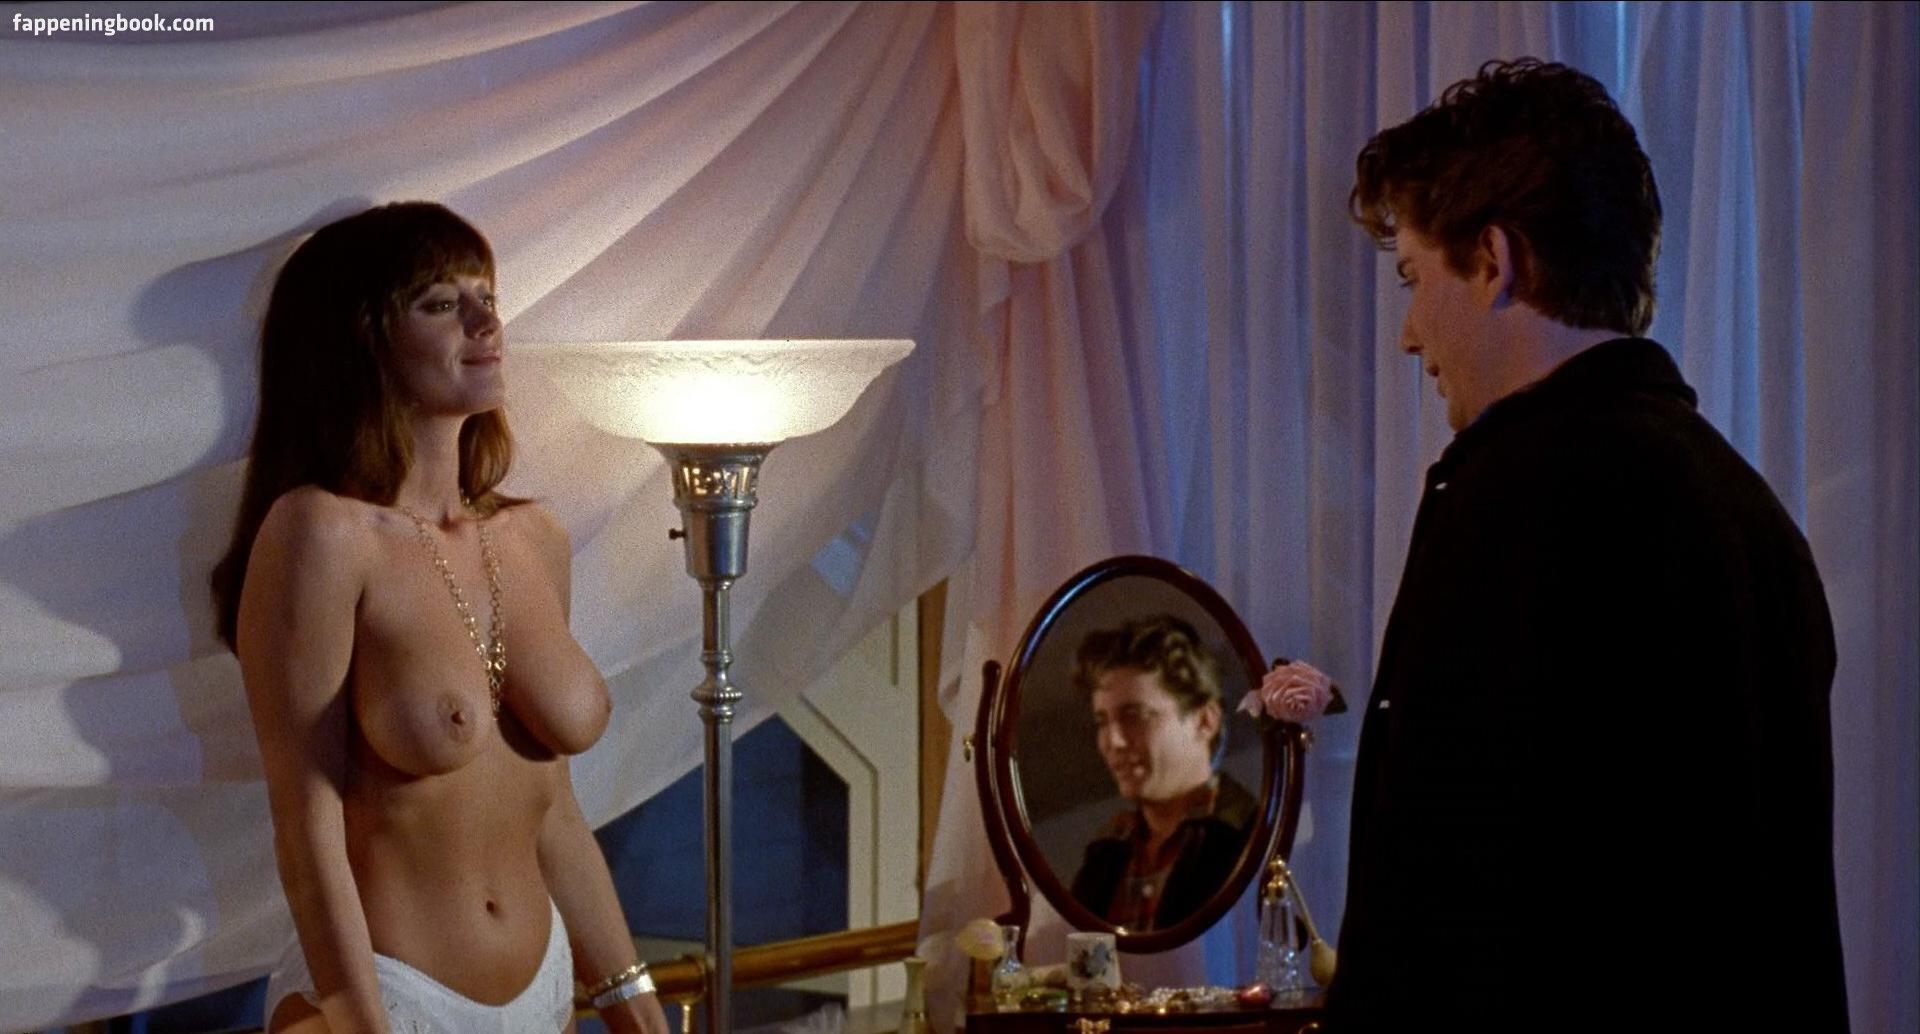 Ava Fabian Porno ava fabian nude, sexy, the fappening, uncensored - photo